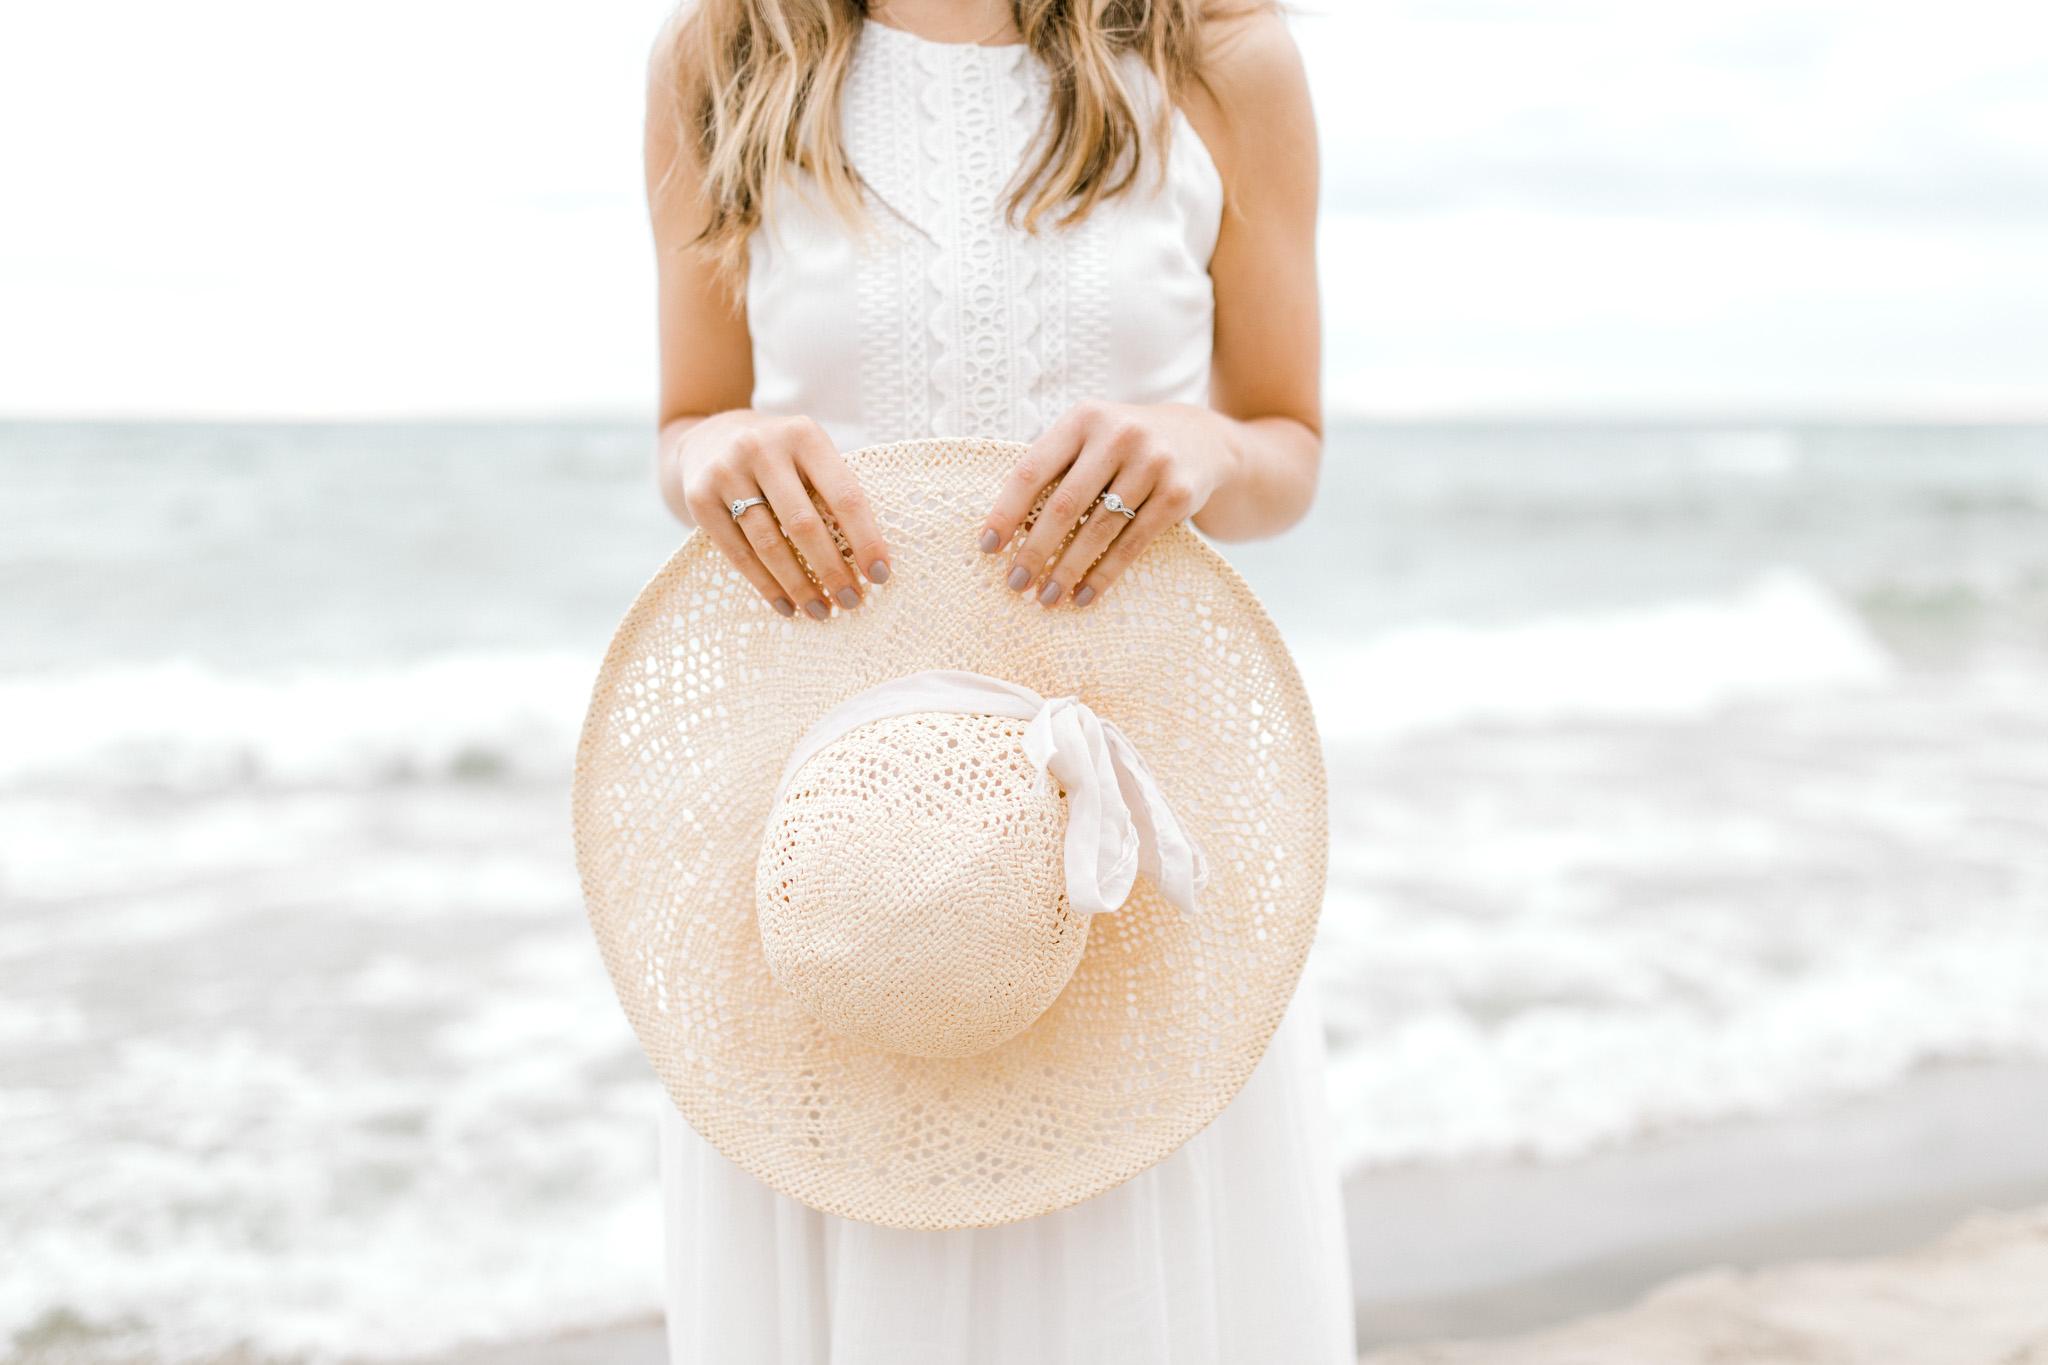 Dreamy Lake Michigan Beach Session | West Michigan Engagement | Cloudy Beach Session | Laurenda Marie Photography | West Michigan Wedding Photographer